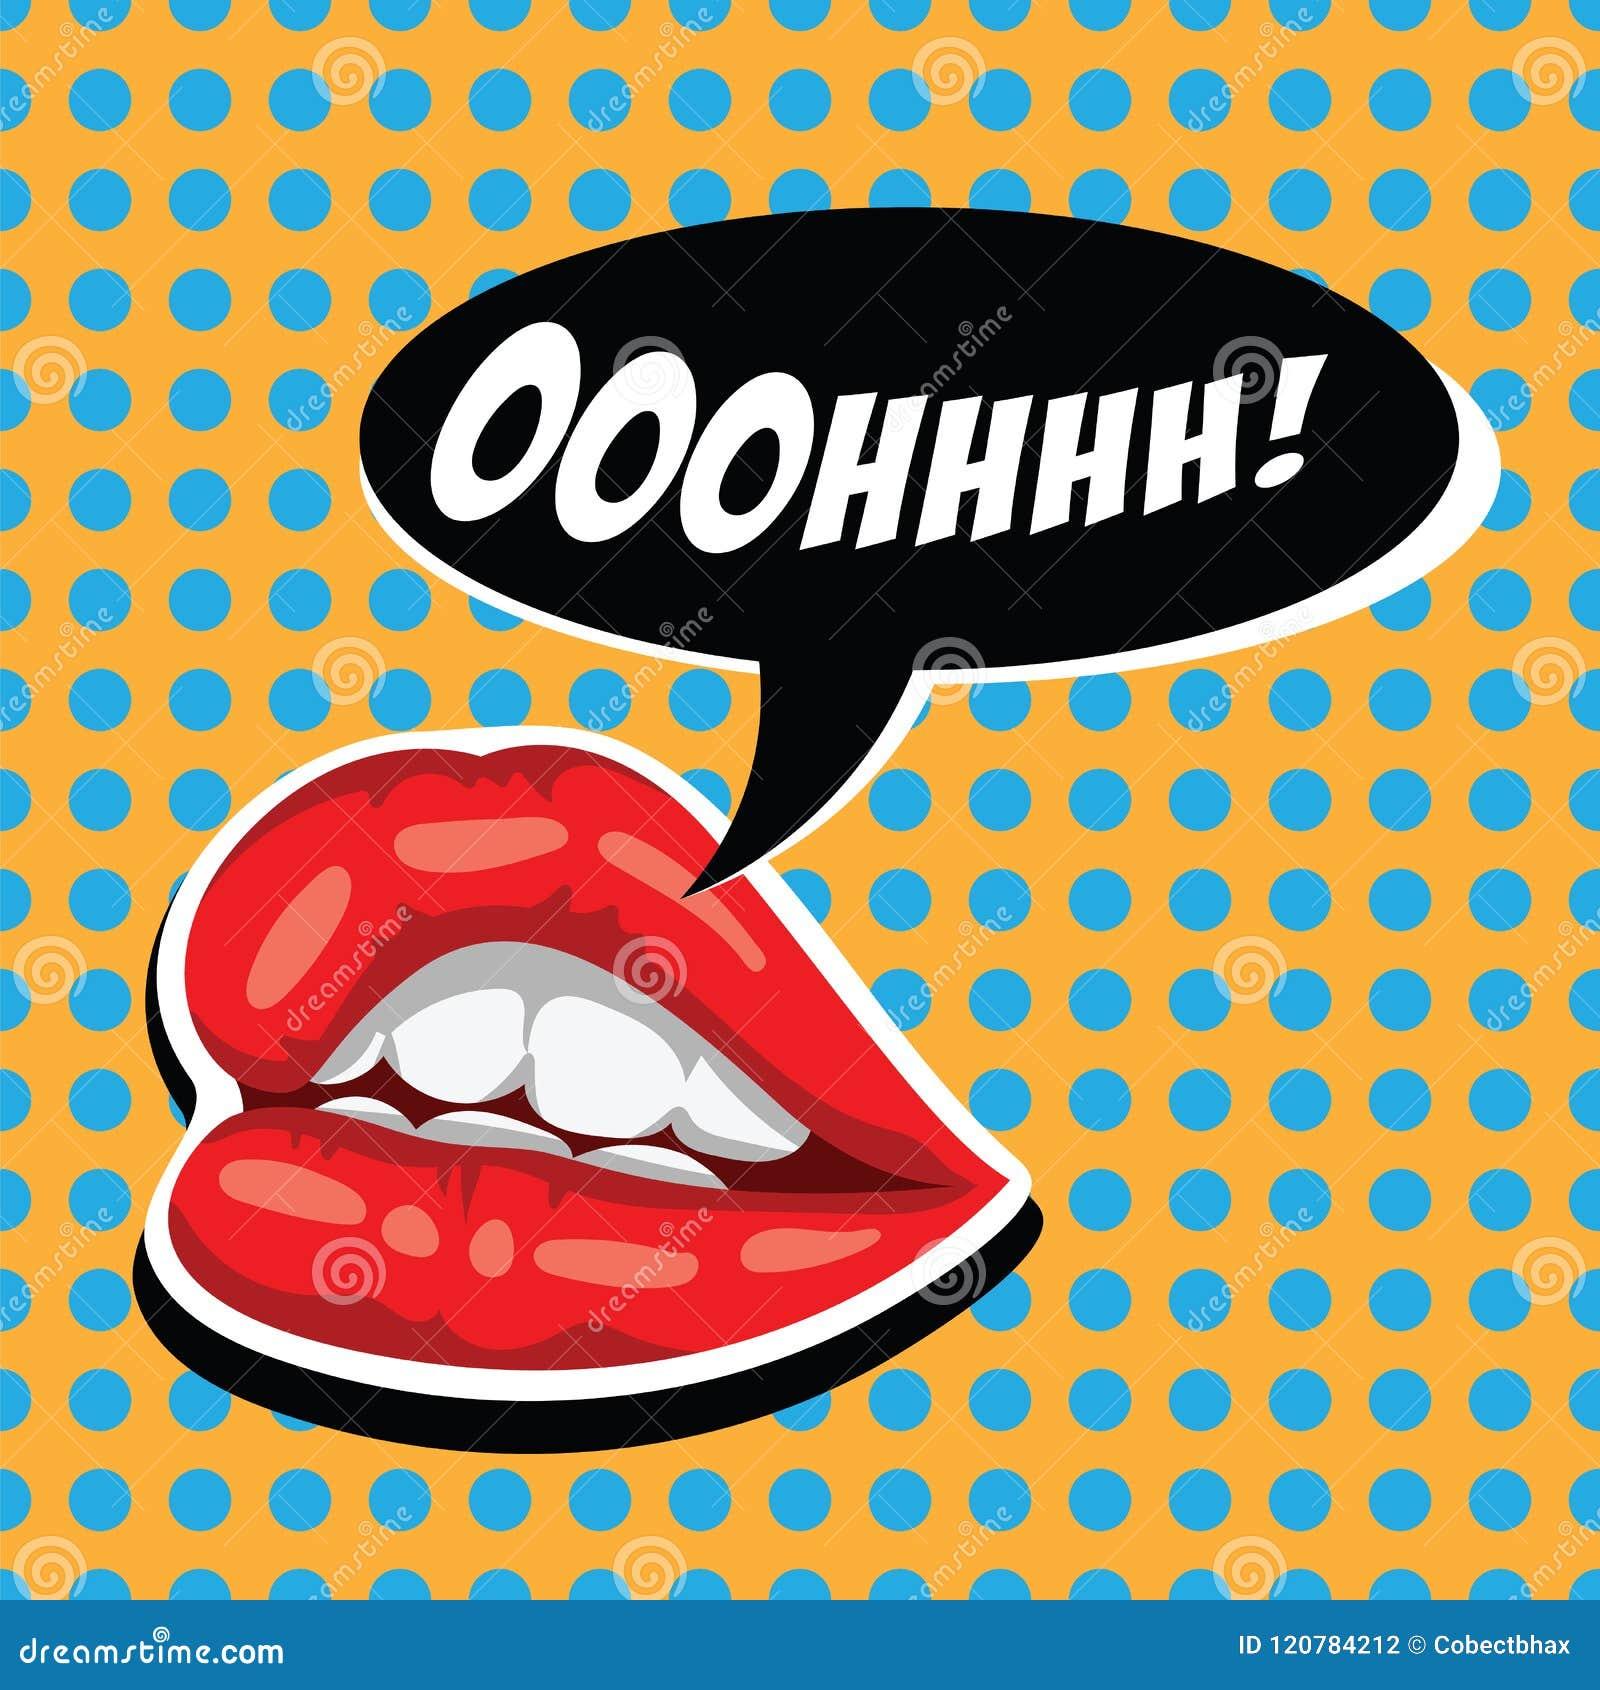 Vrouwen rode lippen en grappige toespraakbel Vrouwelijke mond met toespraakbel Aantrekkelijke meisjeslippen en open mond amerikaa